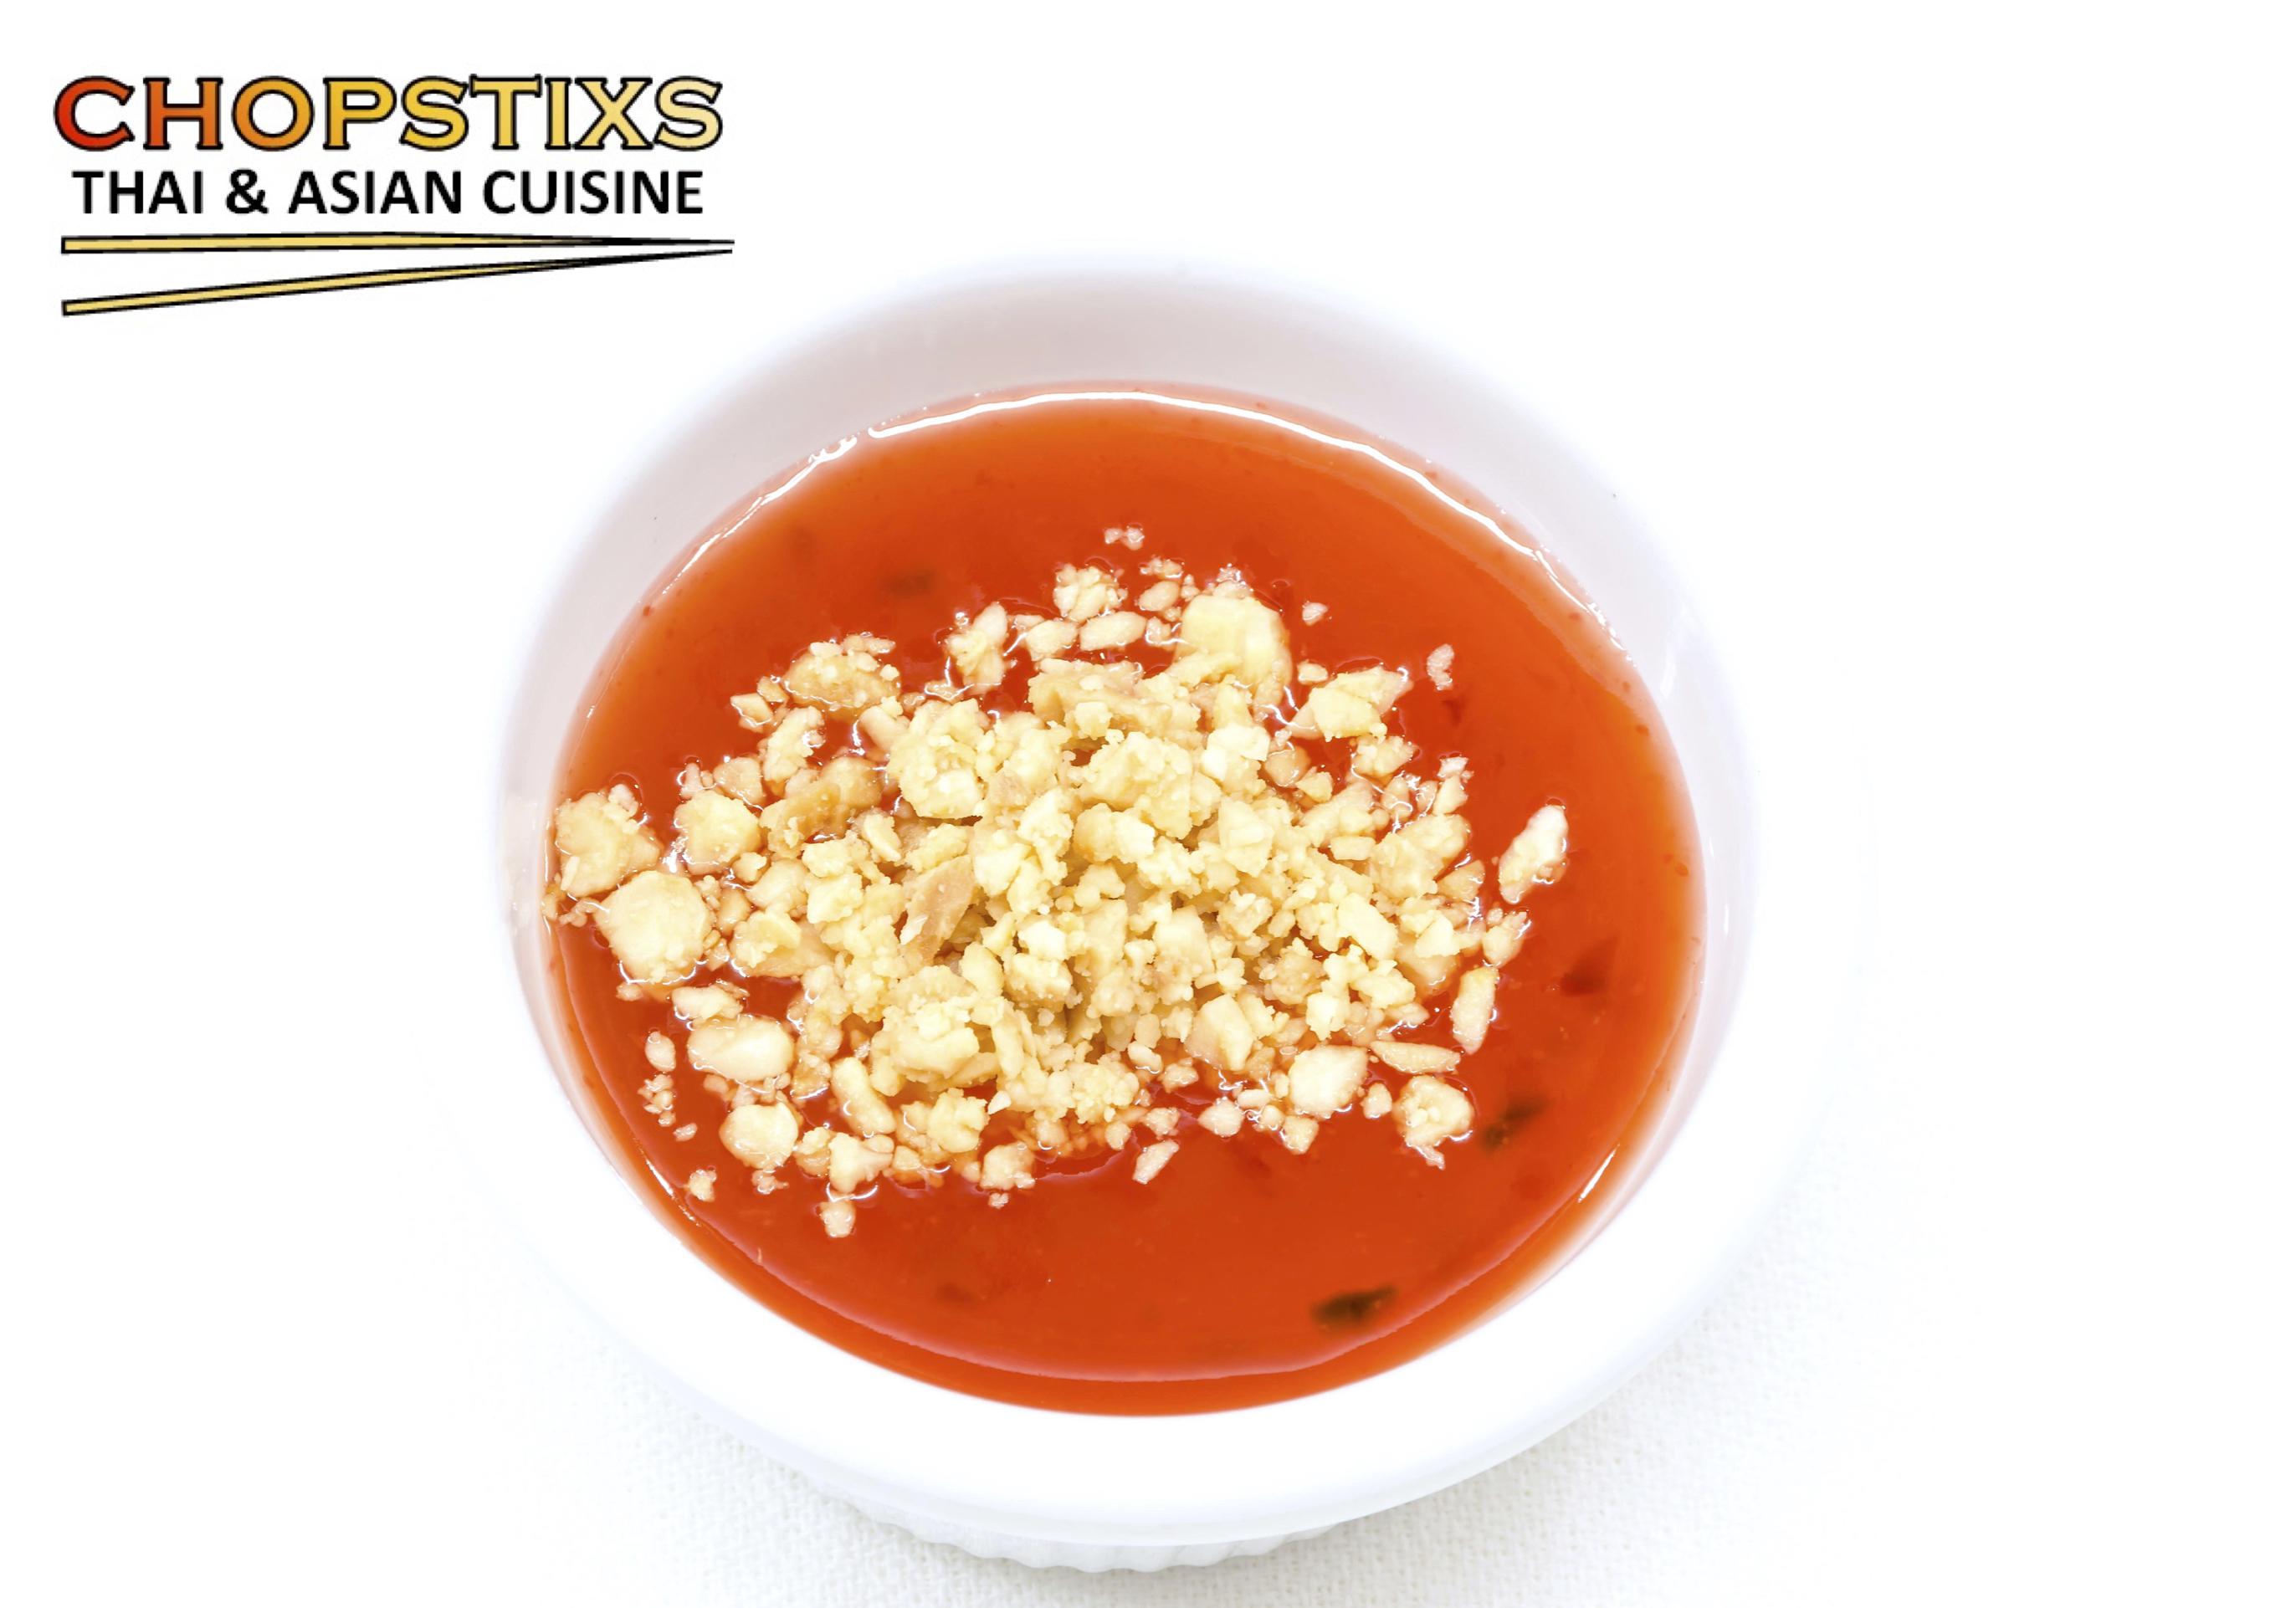 Sweet sauce W/ Ground peanut